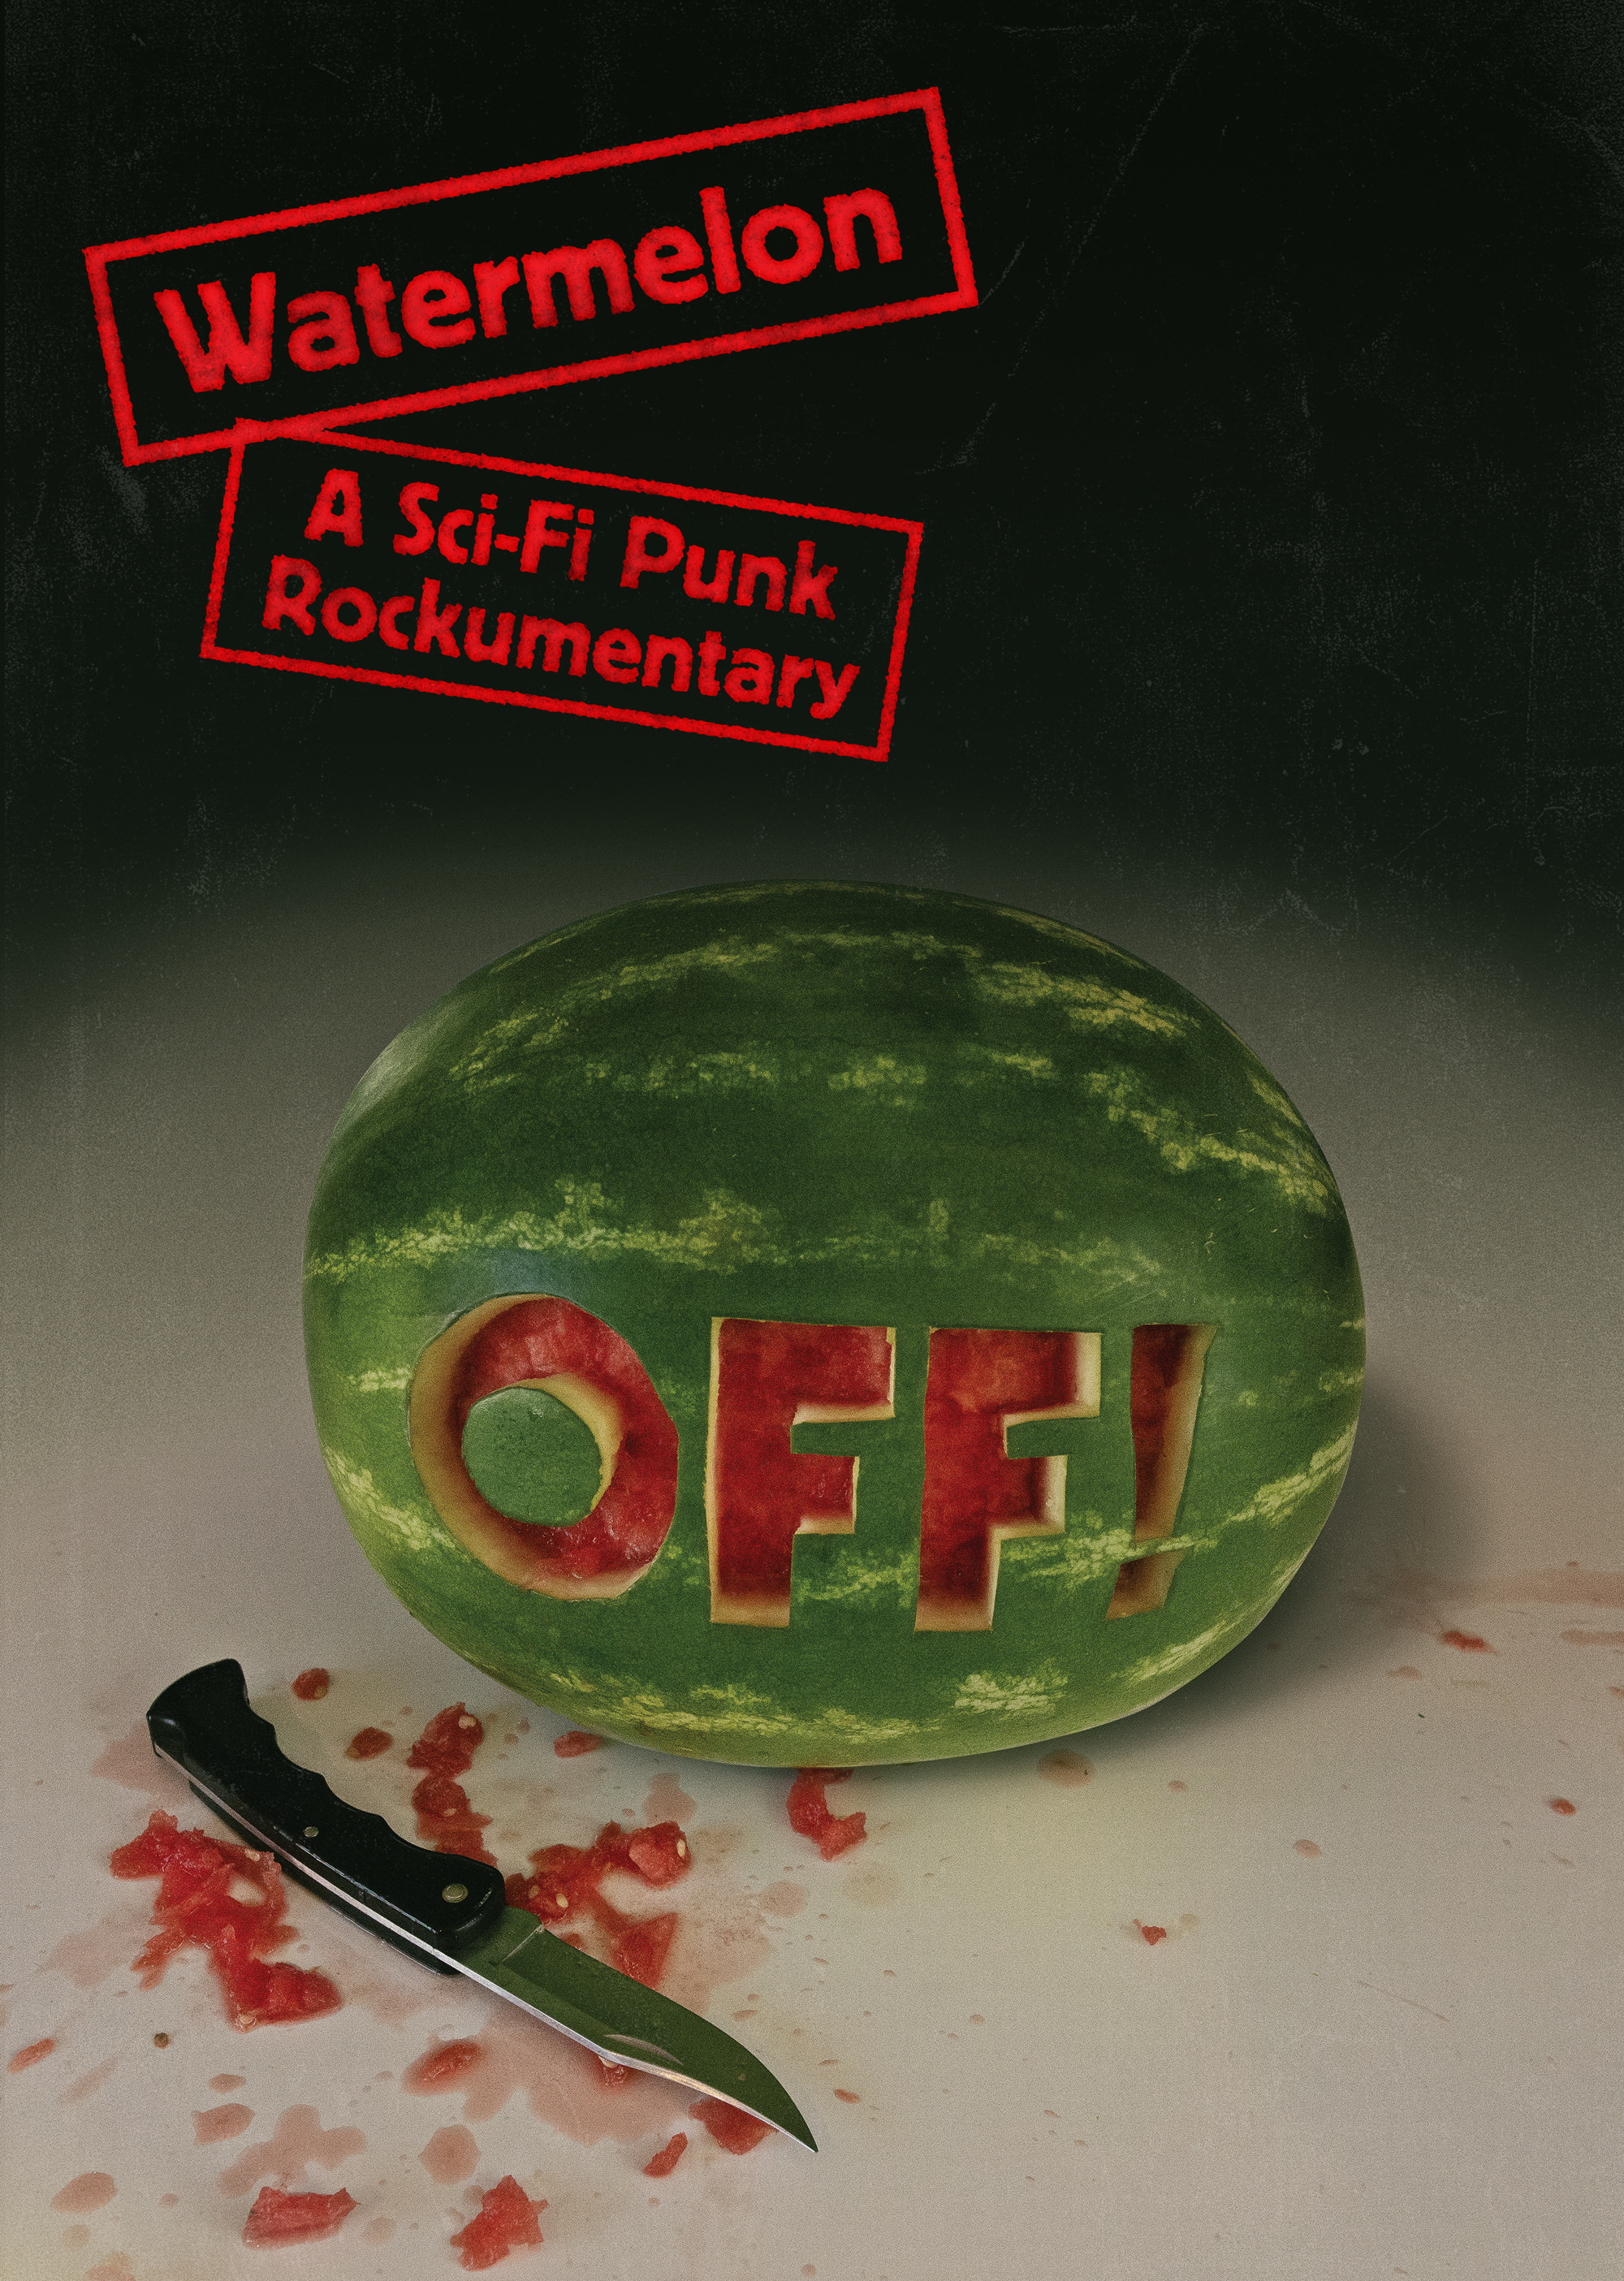 Watermelon movie poster.jpg